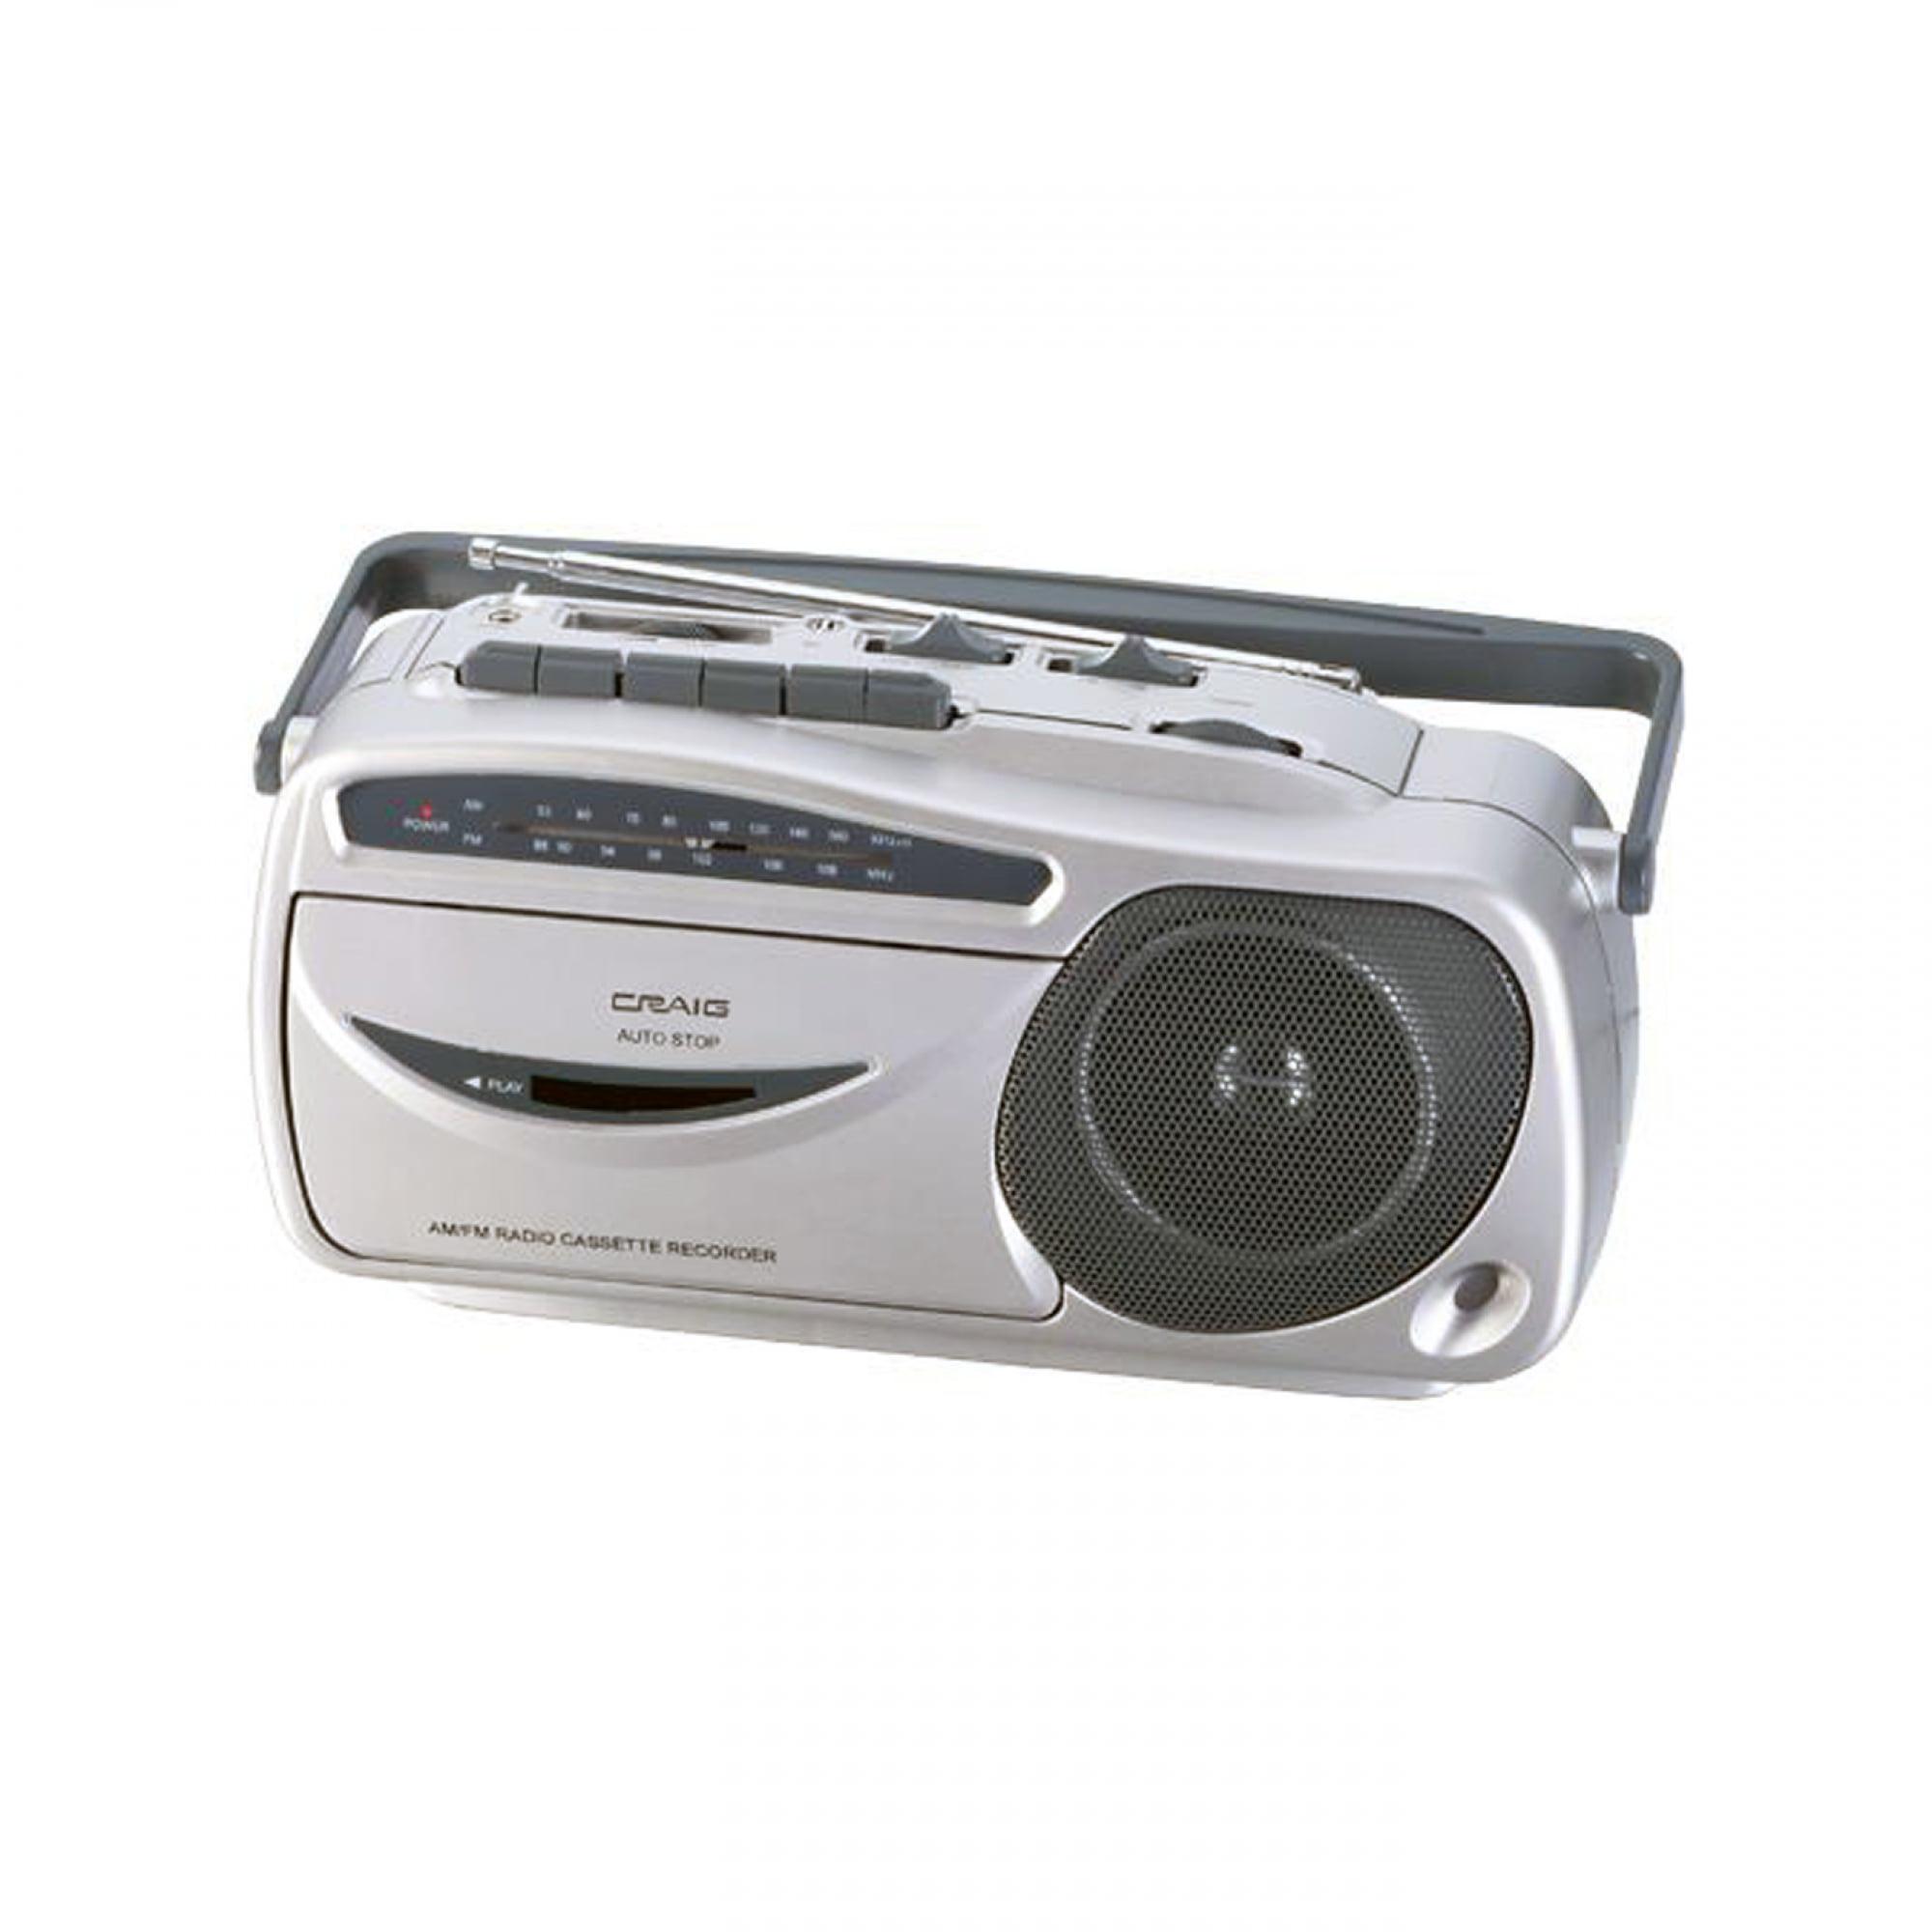 Craig Electronics CD6911 Craig Cd6911 Portable Amfm Radio Cassette Recorder Player by Craig